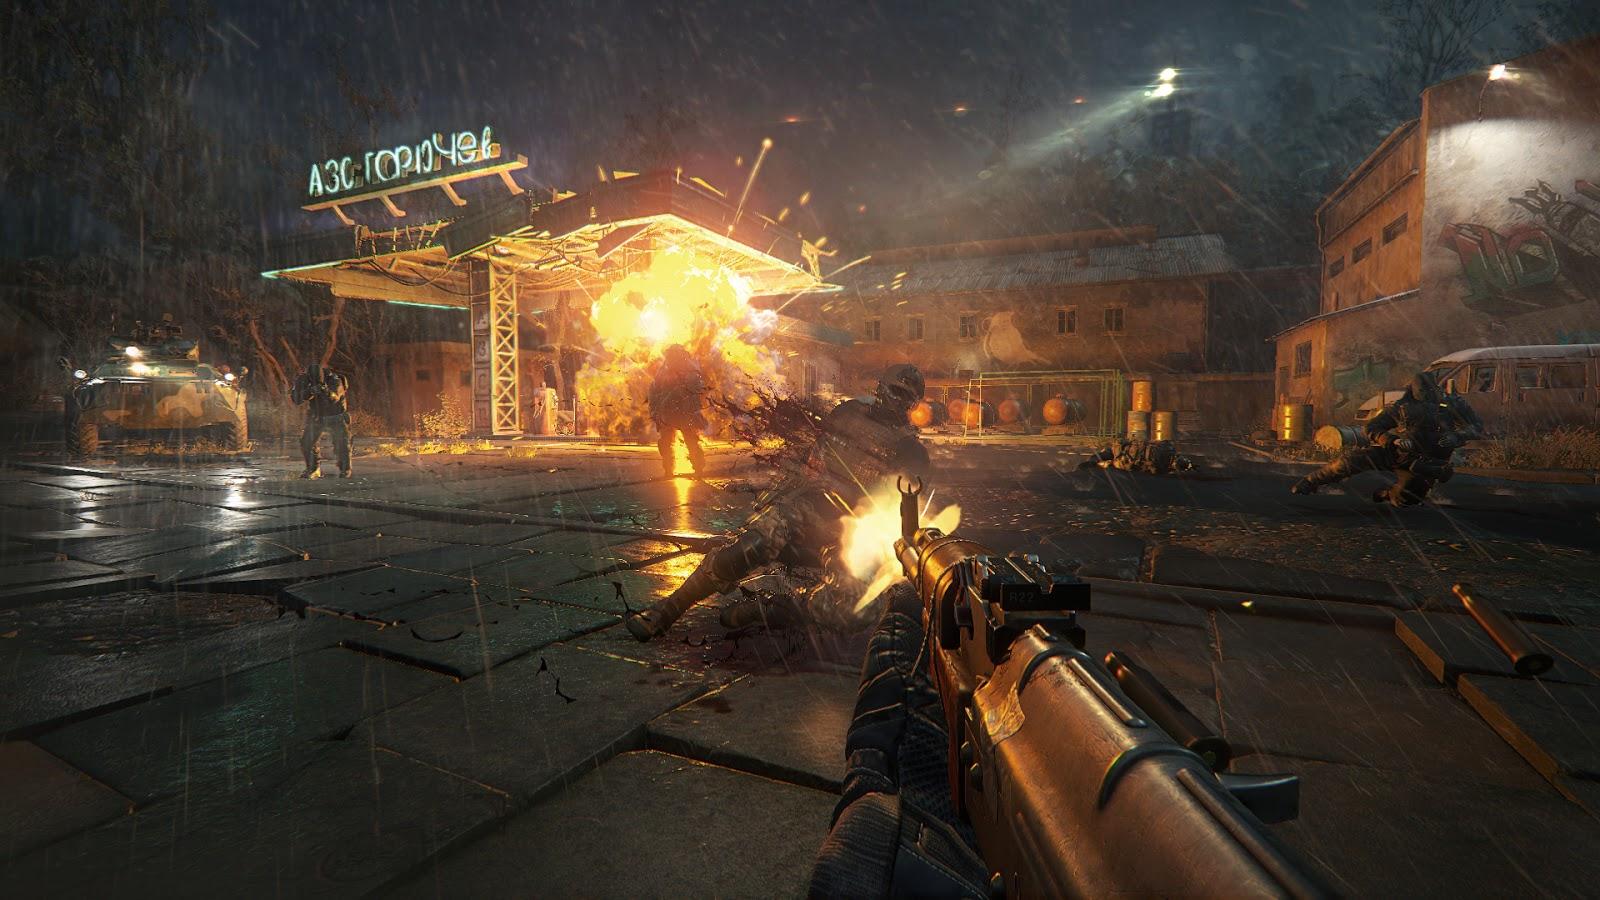 Sniper Ghost Warrior 3 ESPAÑOL PC (CPY) + Update v1.08 (PLAZA) + REPACK 10 DVD5 (JPW) 8